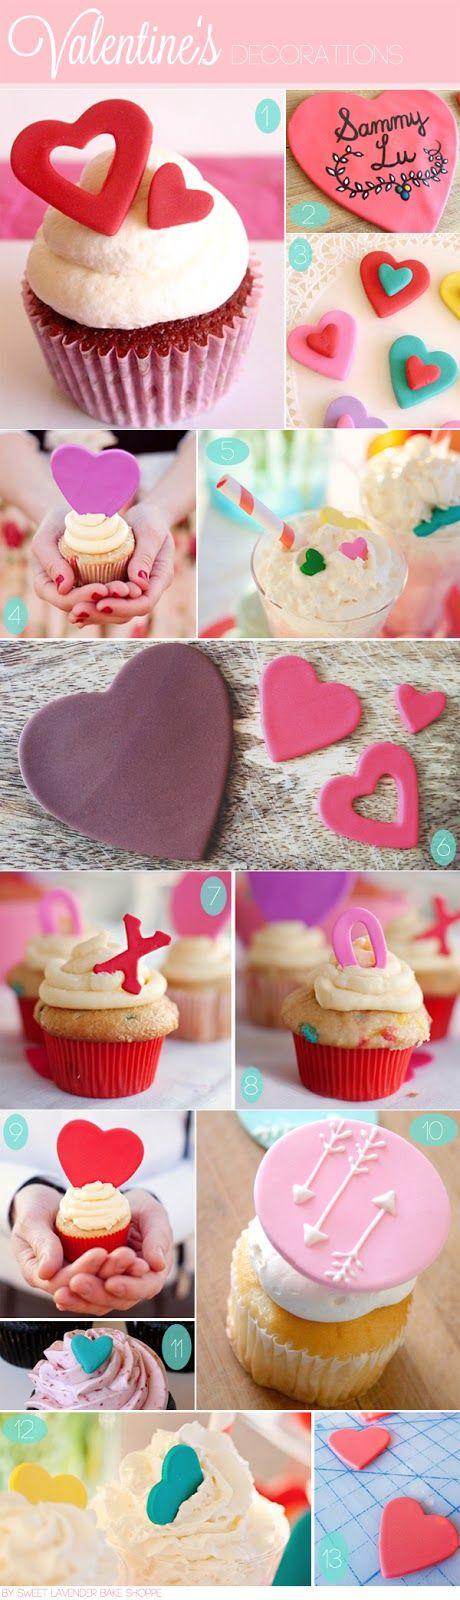 On Pinterest Dollar Tree Valentine Decorations And Decorating Ideas